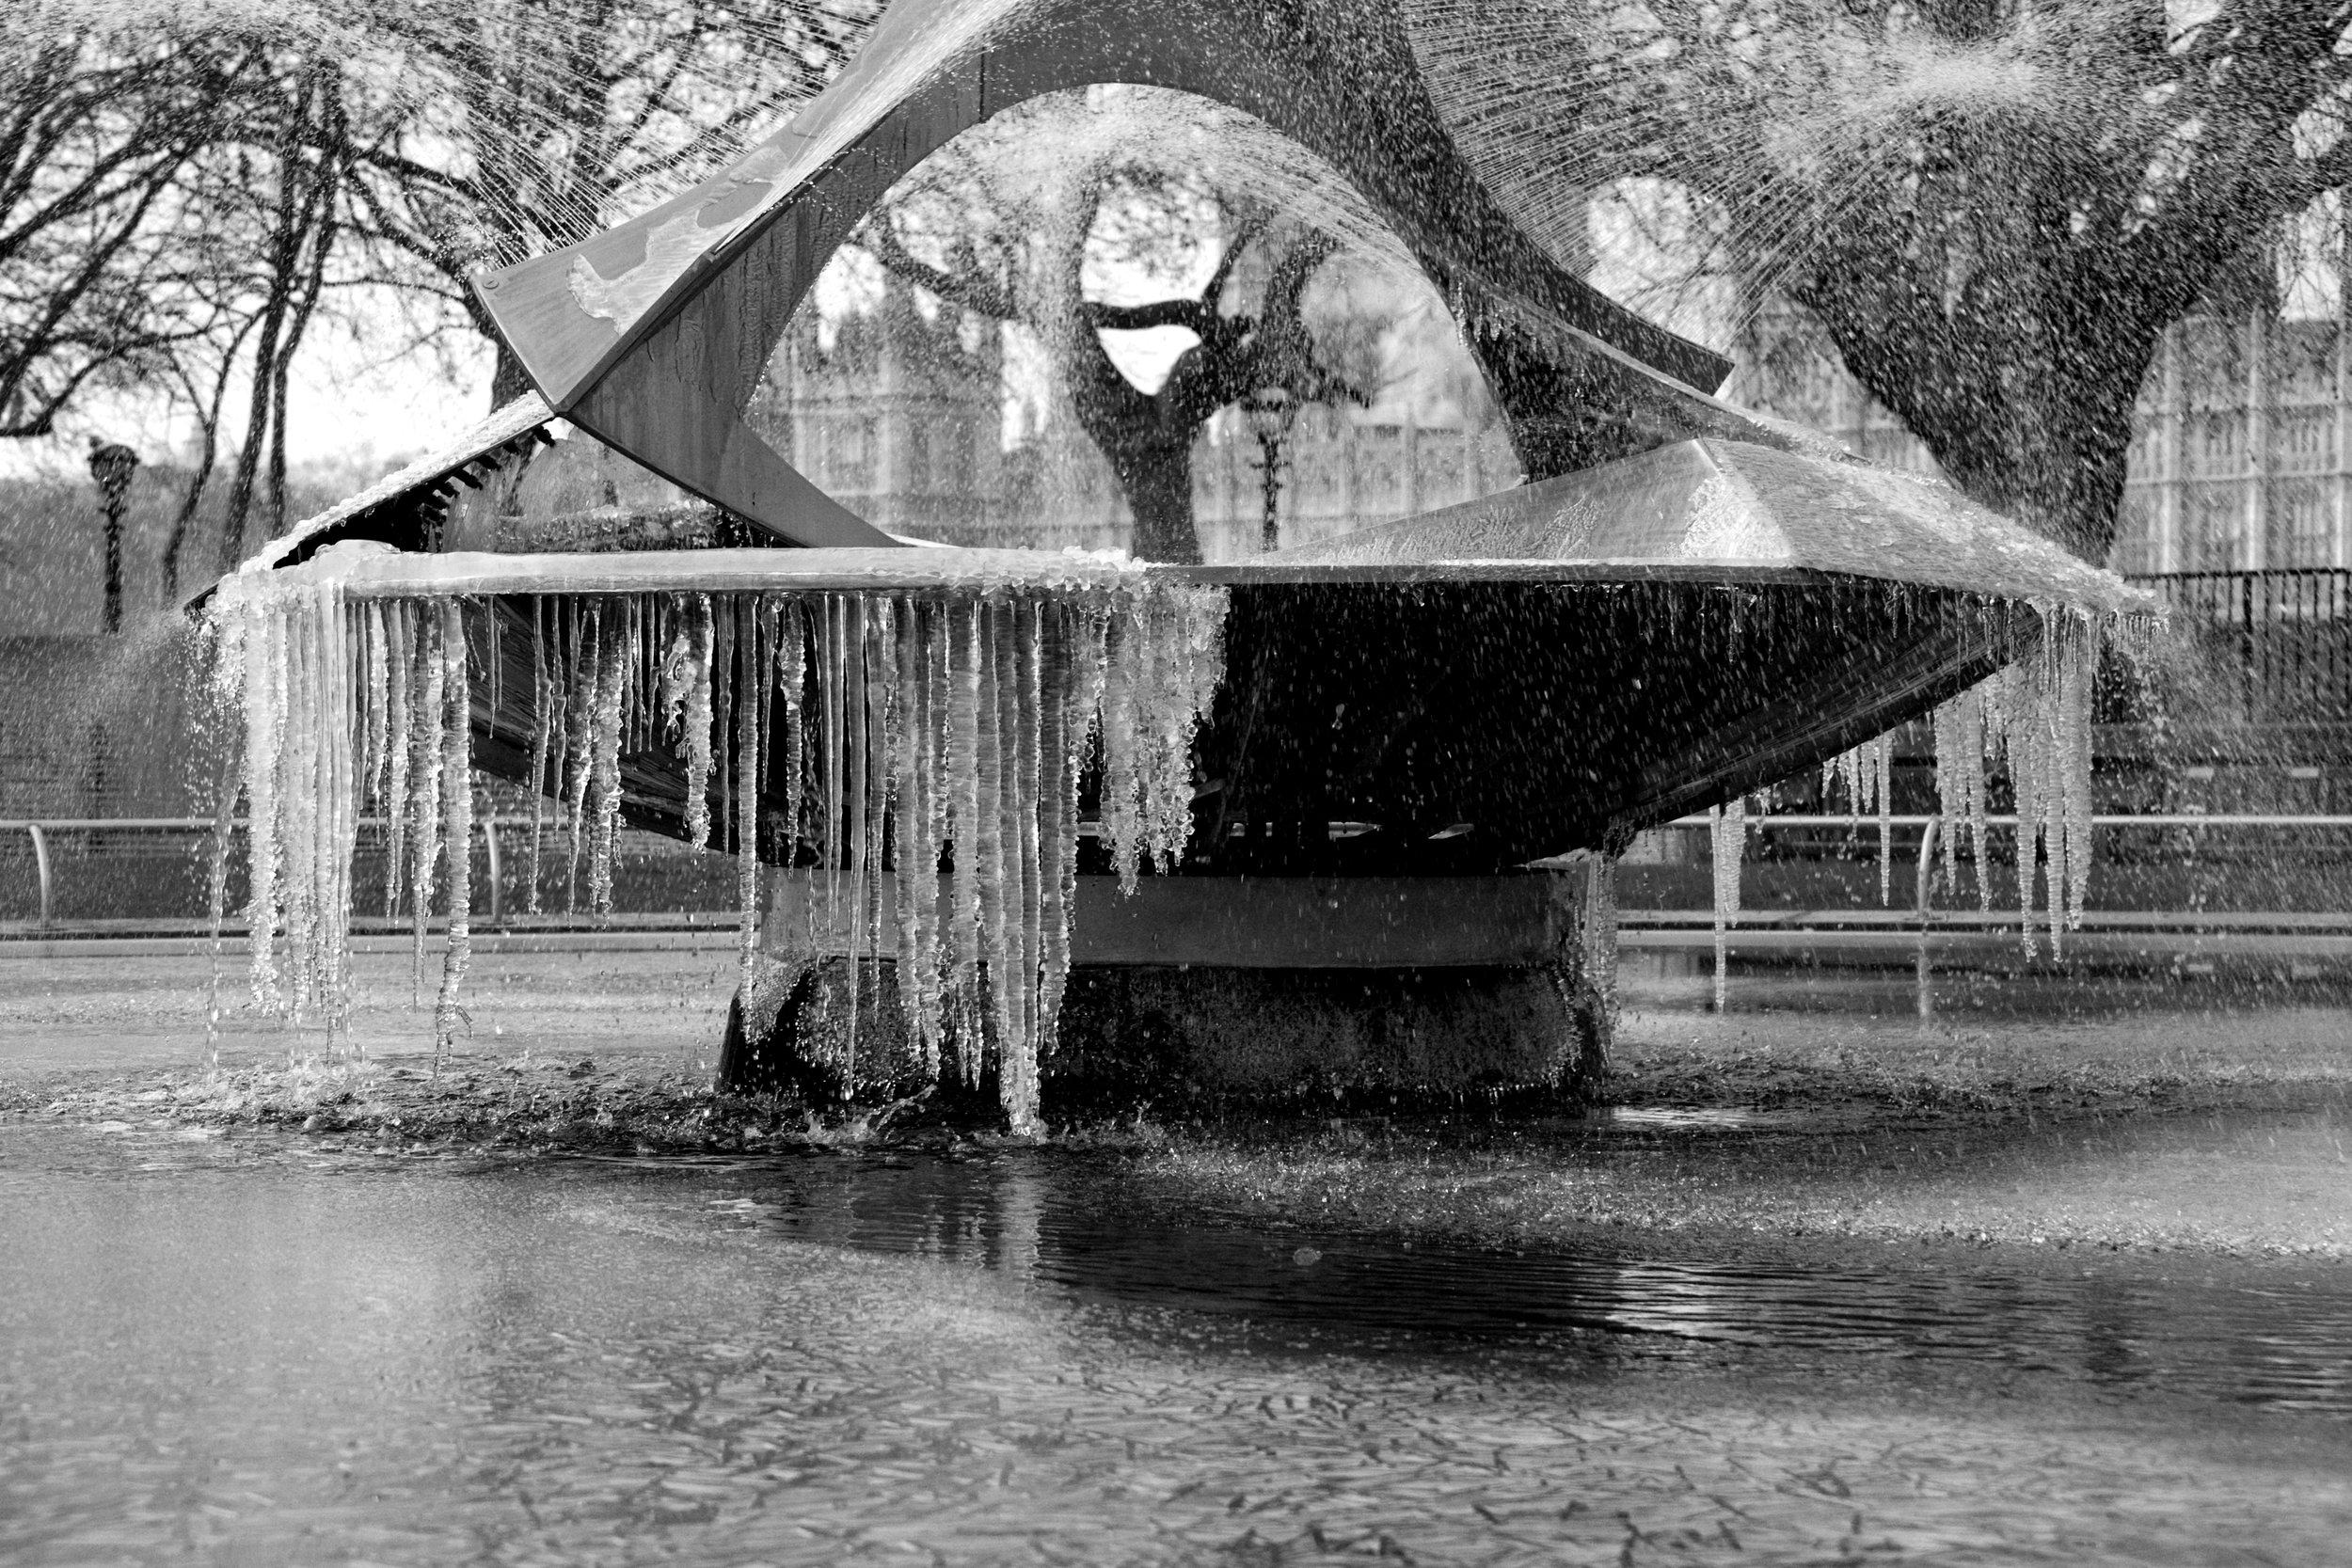 The Frozen Fountain – London Embankment